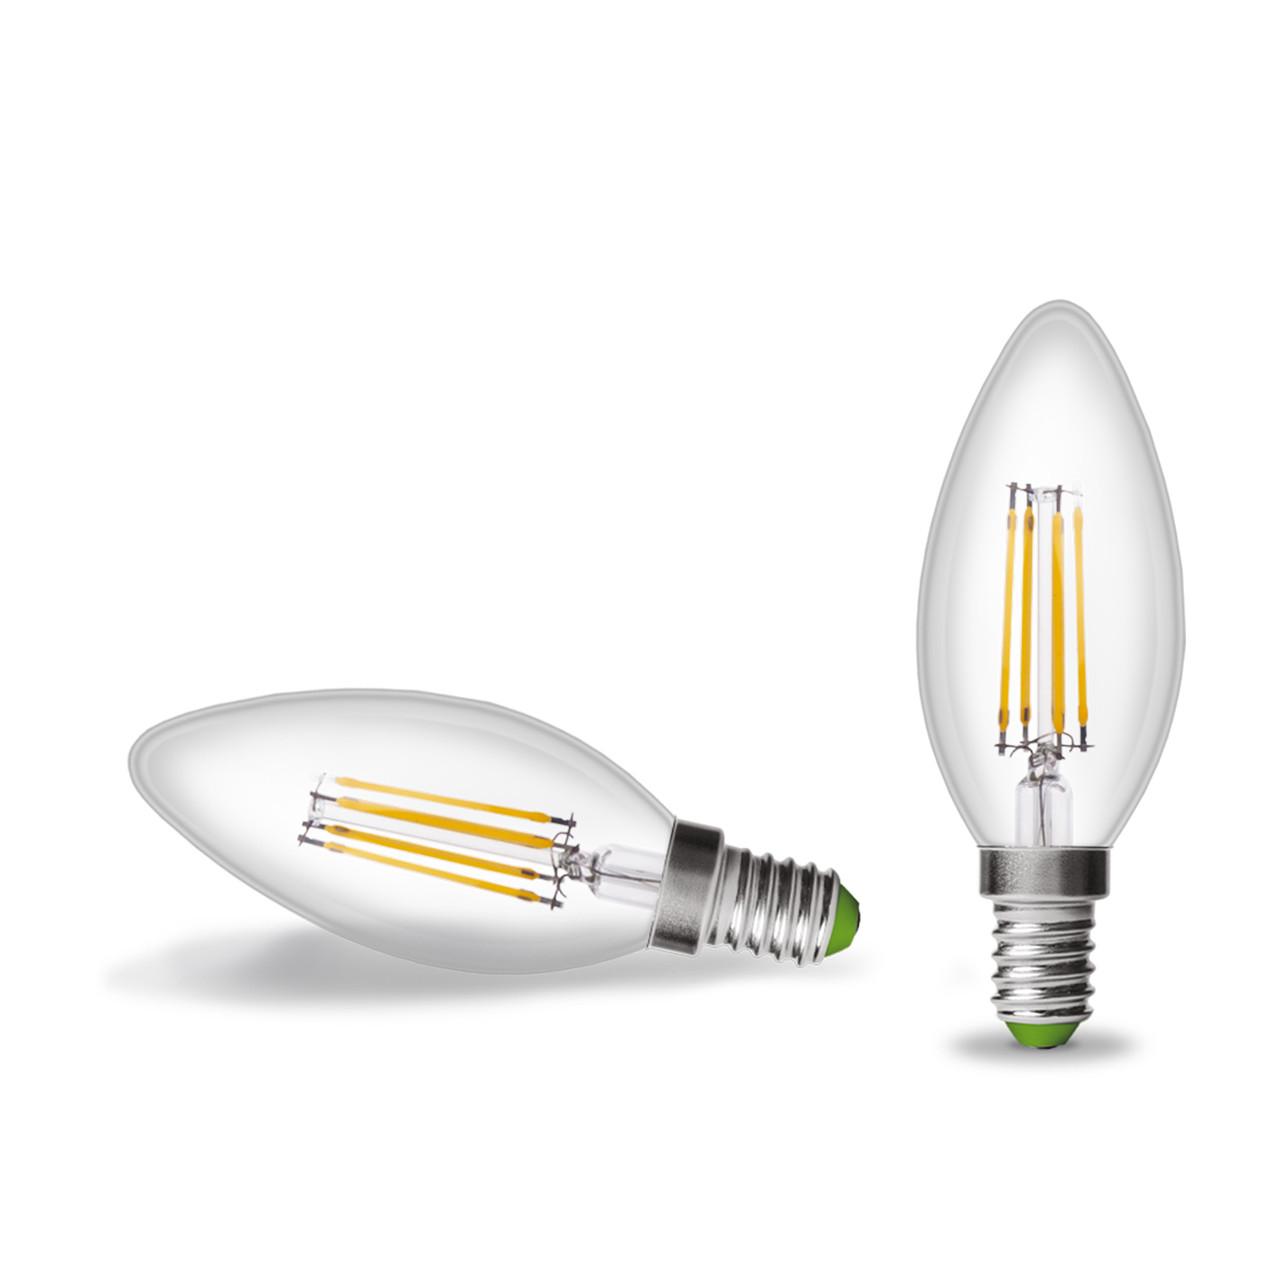 EUROLAMP LED Лампа Свеча ArtDeco 4W E14 2700K (прозрачная)